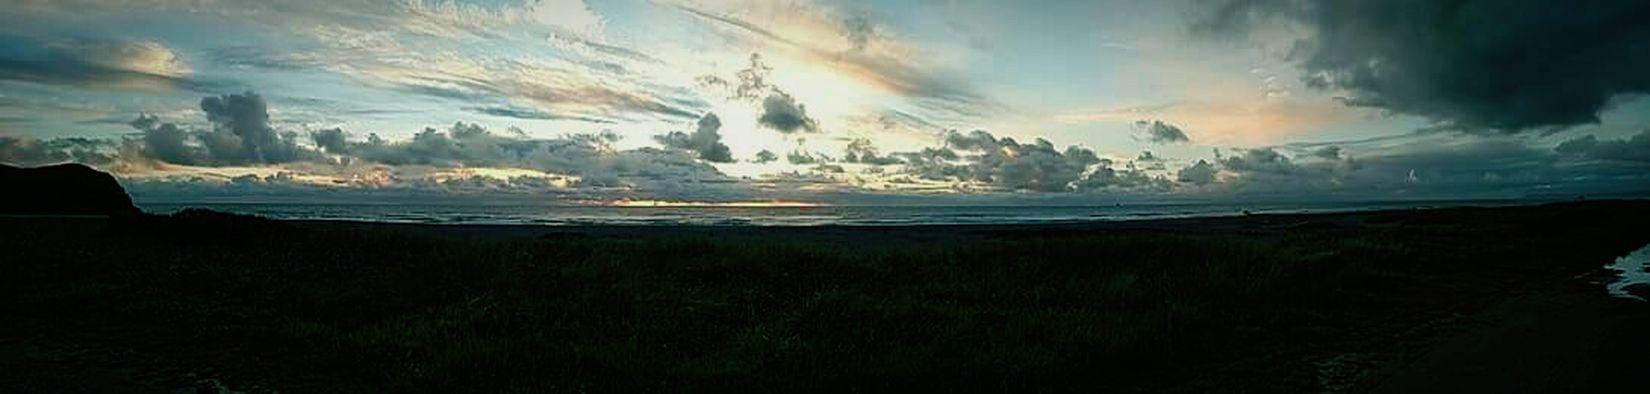 sunset, clouds, stormy, ocean, beach, panoramic